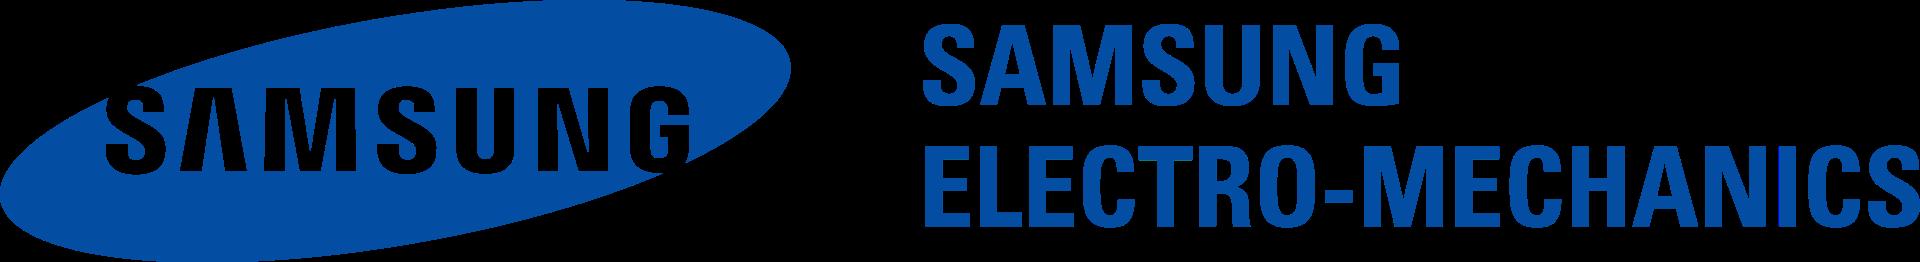 Samsung Electro-Mechanics